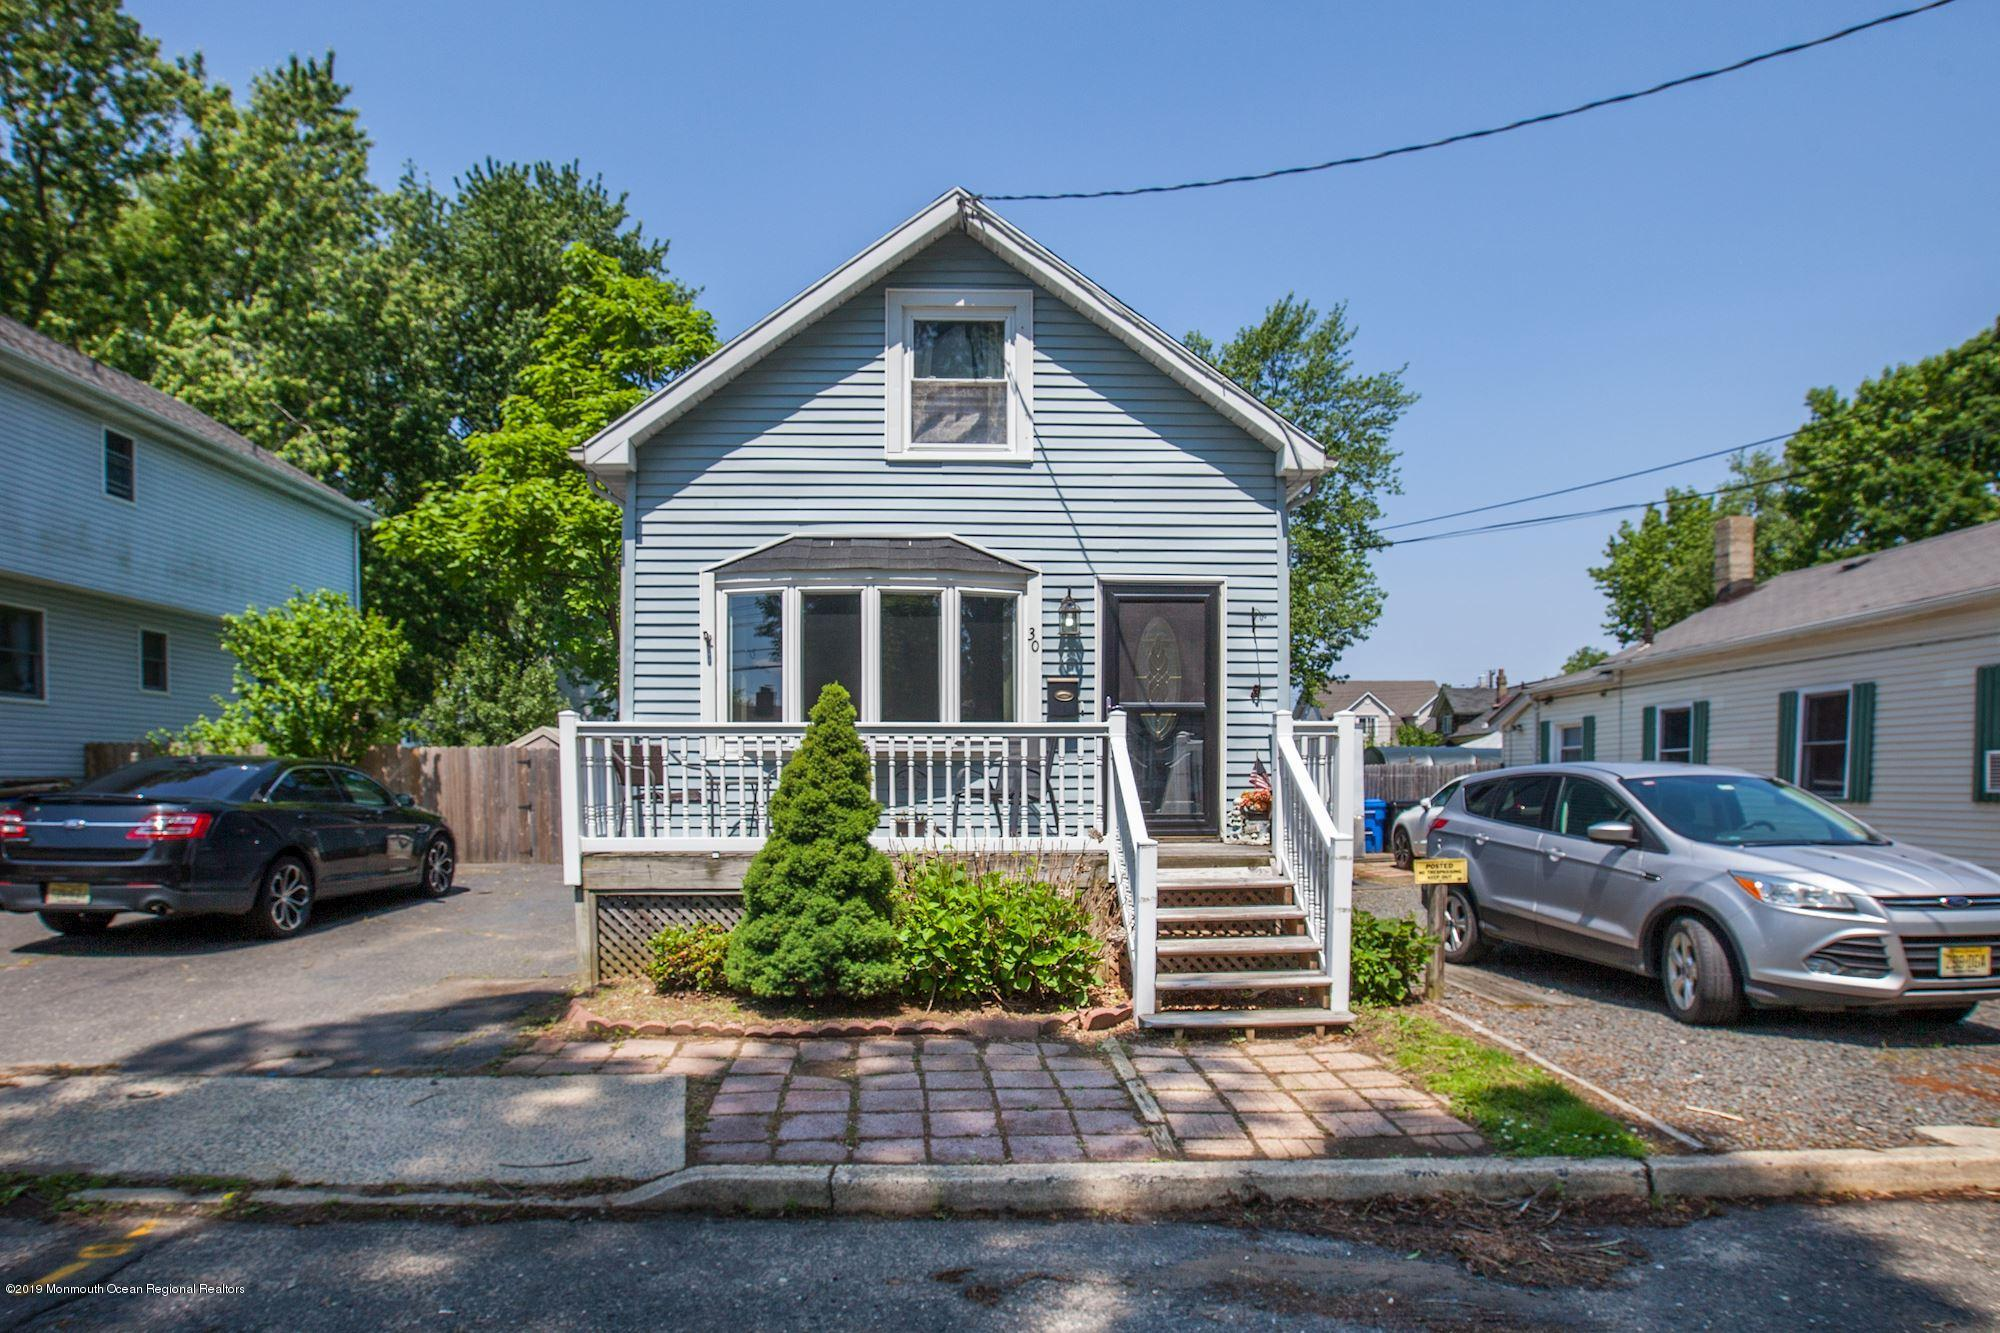 Photo of 30 York Avenue, Port Monmouth, NJ 07758